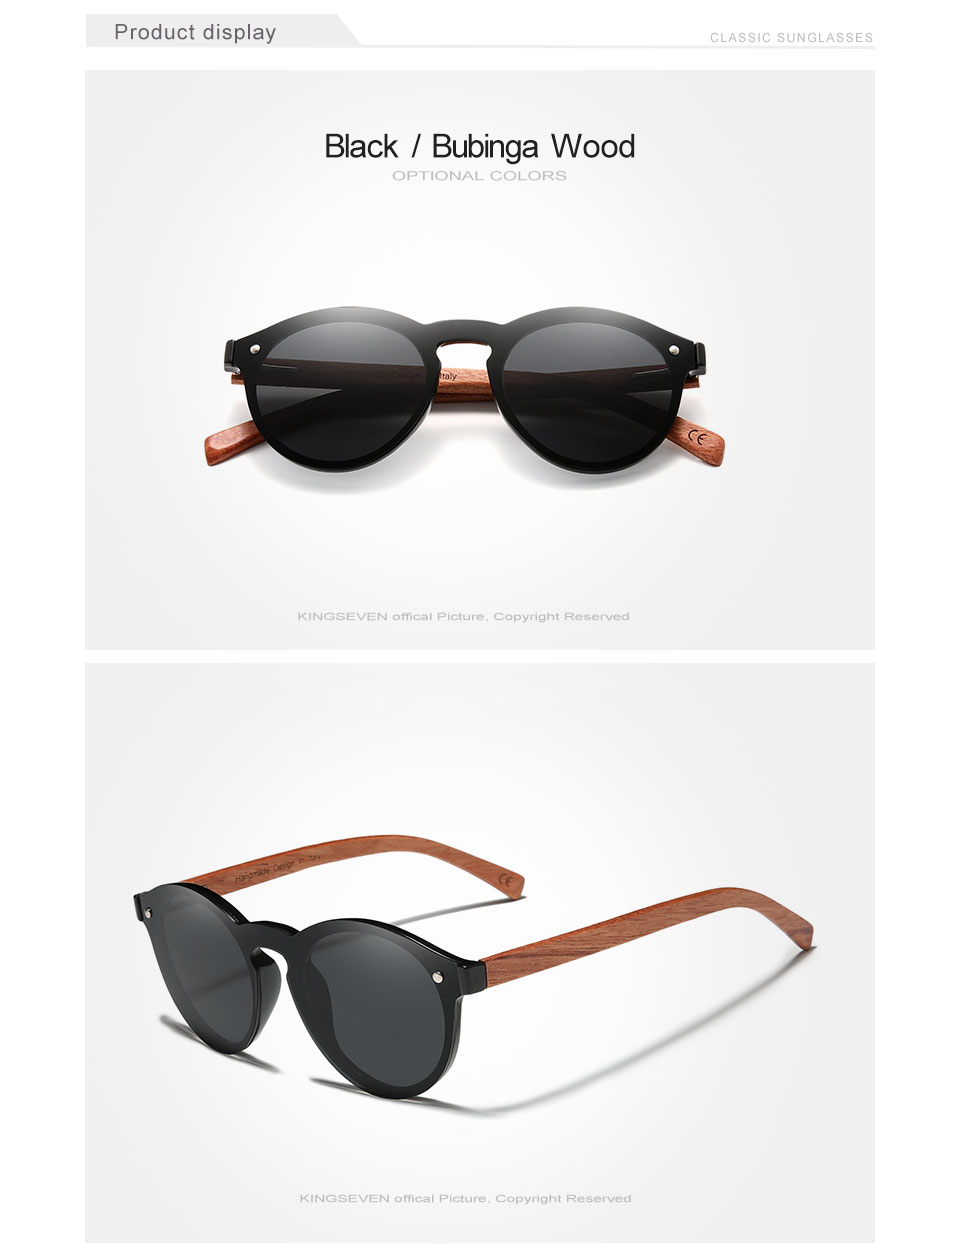 Hdb681ce79a8a43e38031b1a45ef3cd1fr Custom LOGO Natural Wooden Sunglasses GIFTINGER Bubinga Men's Polarized Glasses Wooden Fashion Sun Glasses Original Accessories